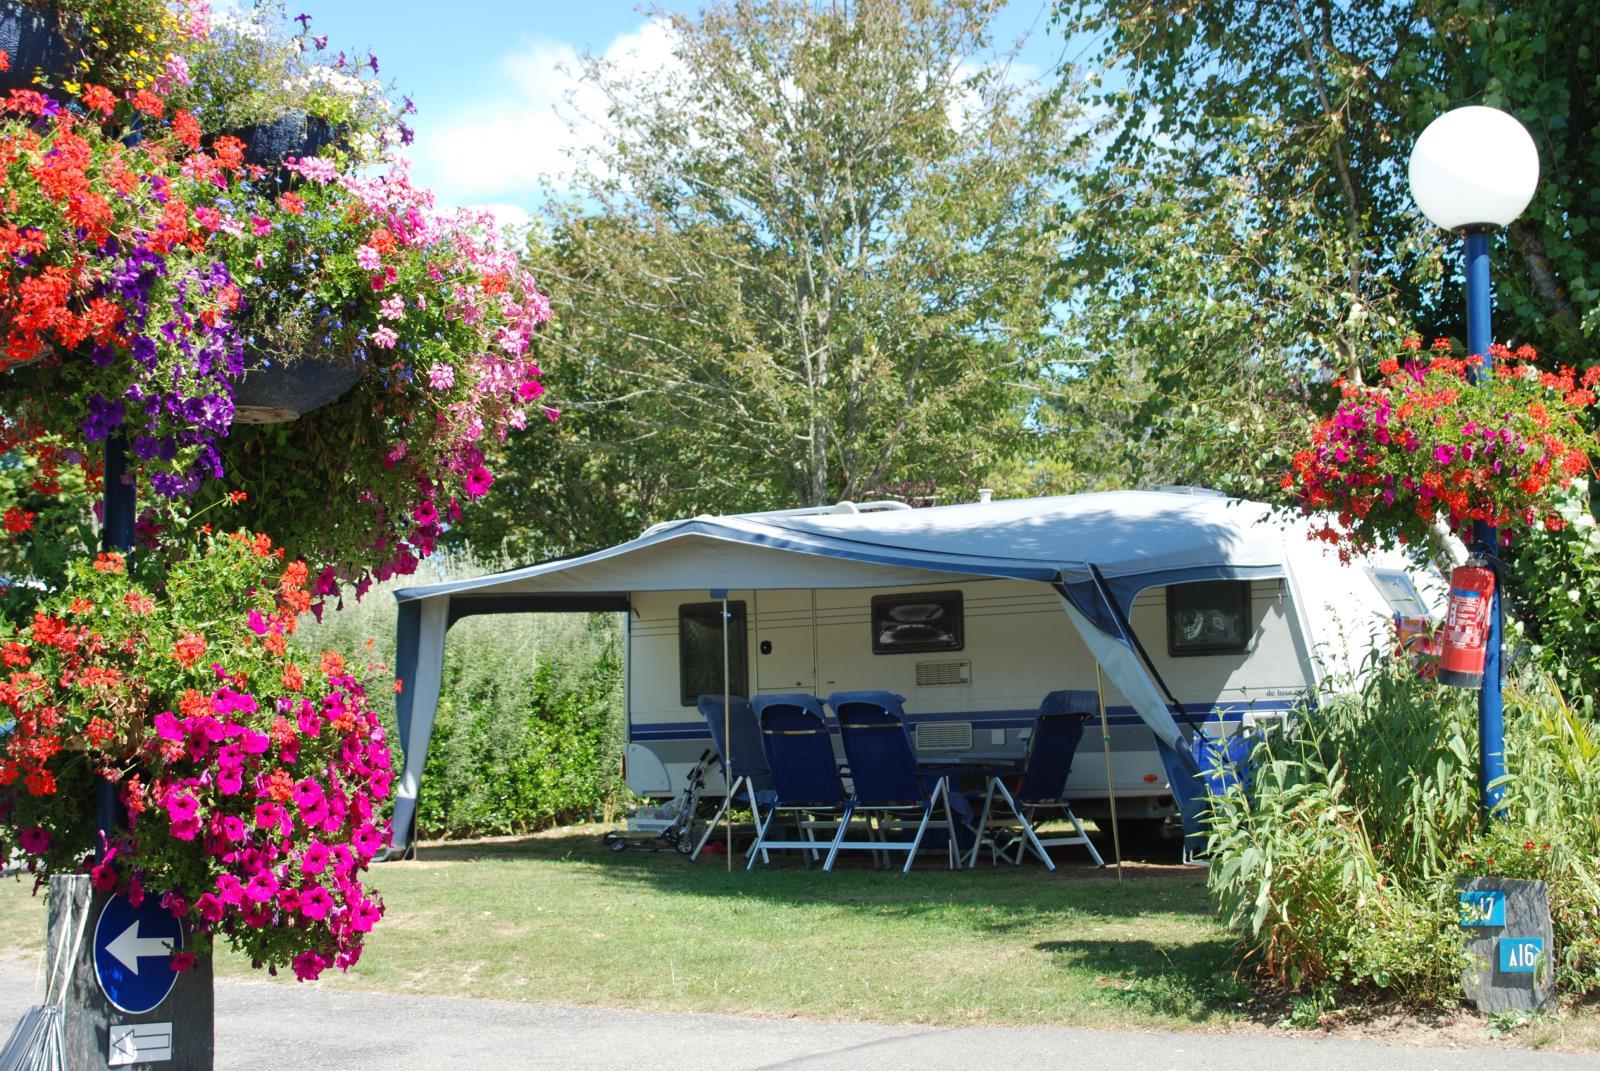 Emplacement - Emplacement - Carte Acsi - Camping Les Embruns